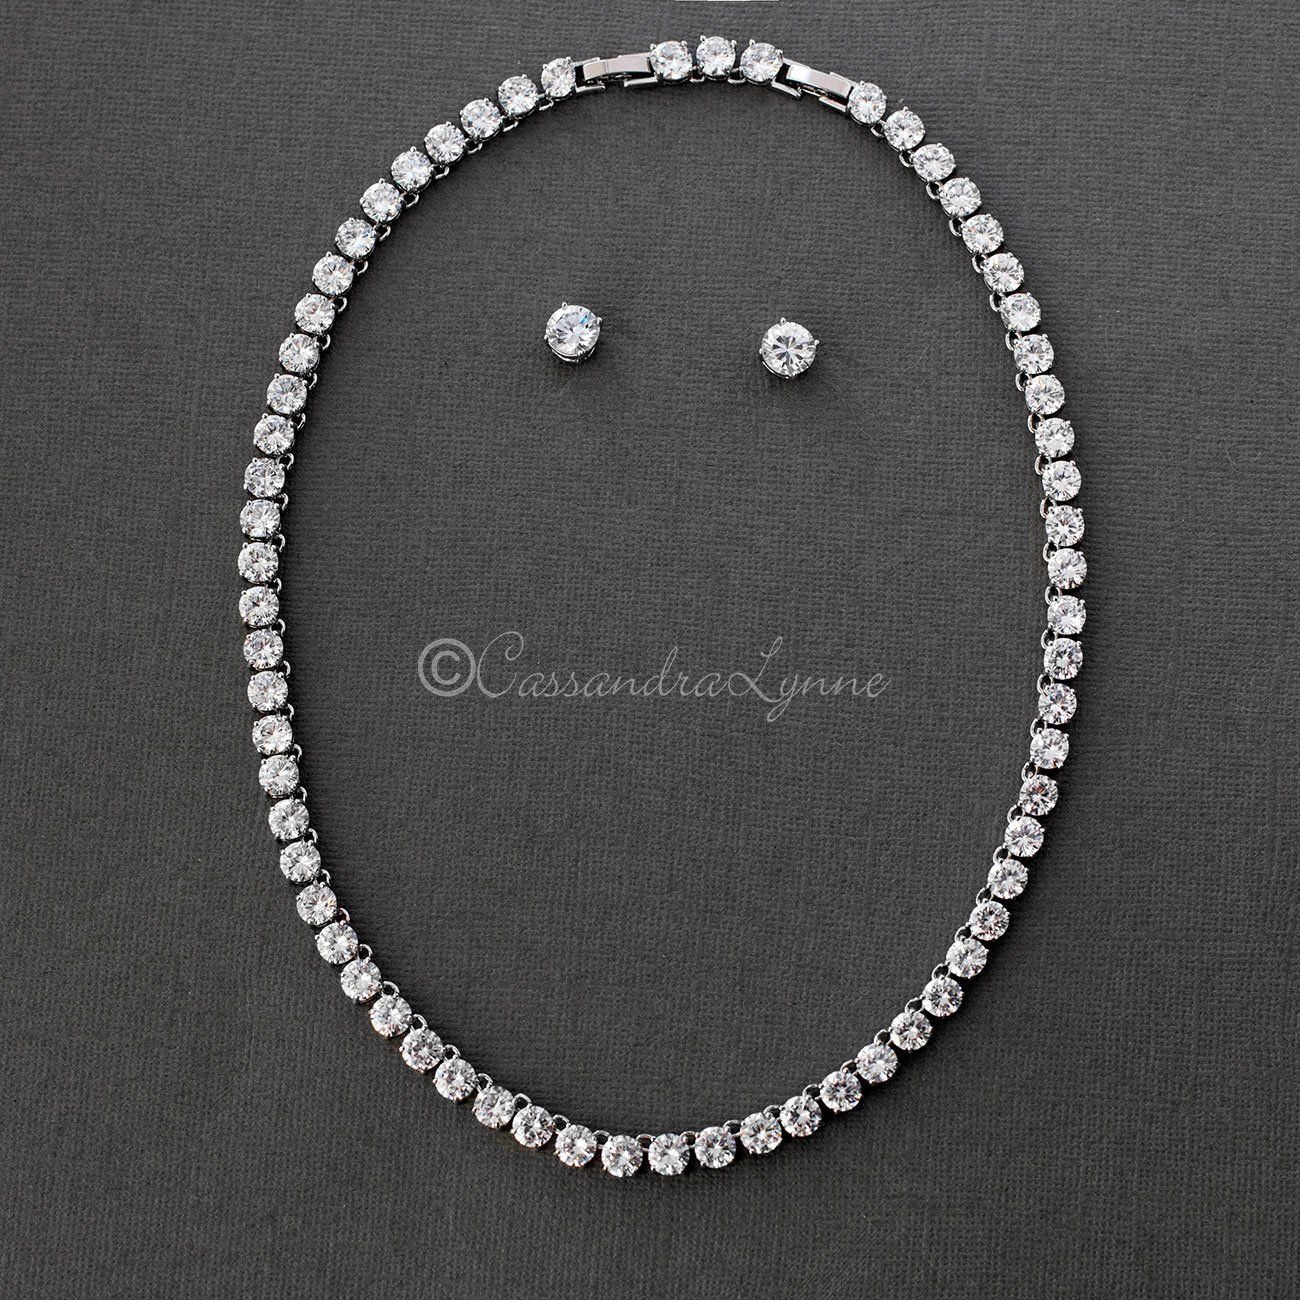 Corona De Diamante Aretes En Plata 7mm Cubic Zirconia Cristal